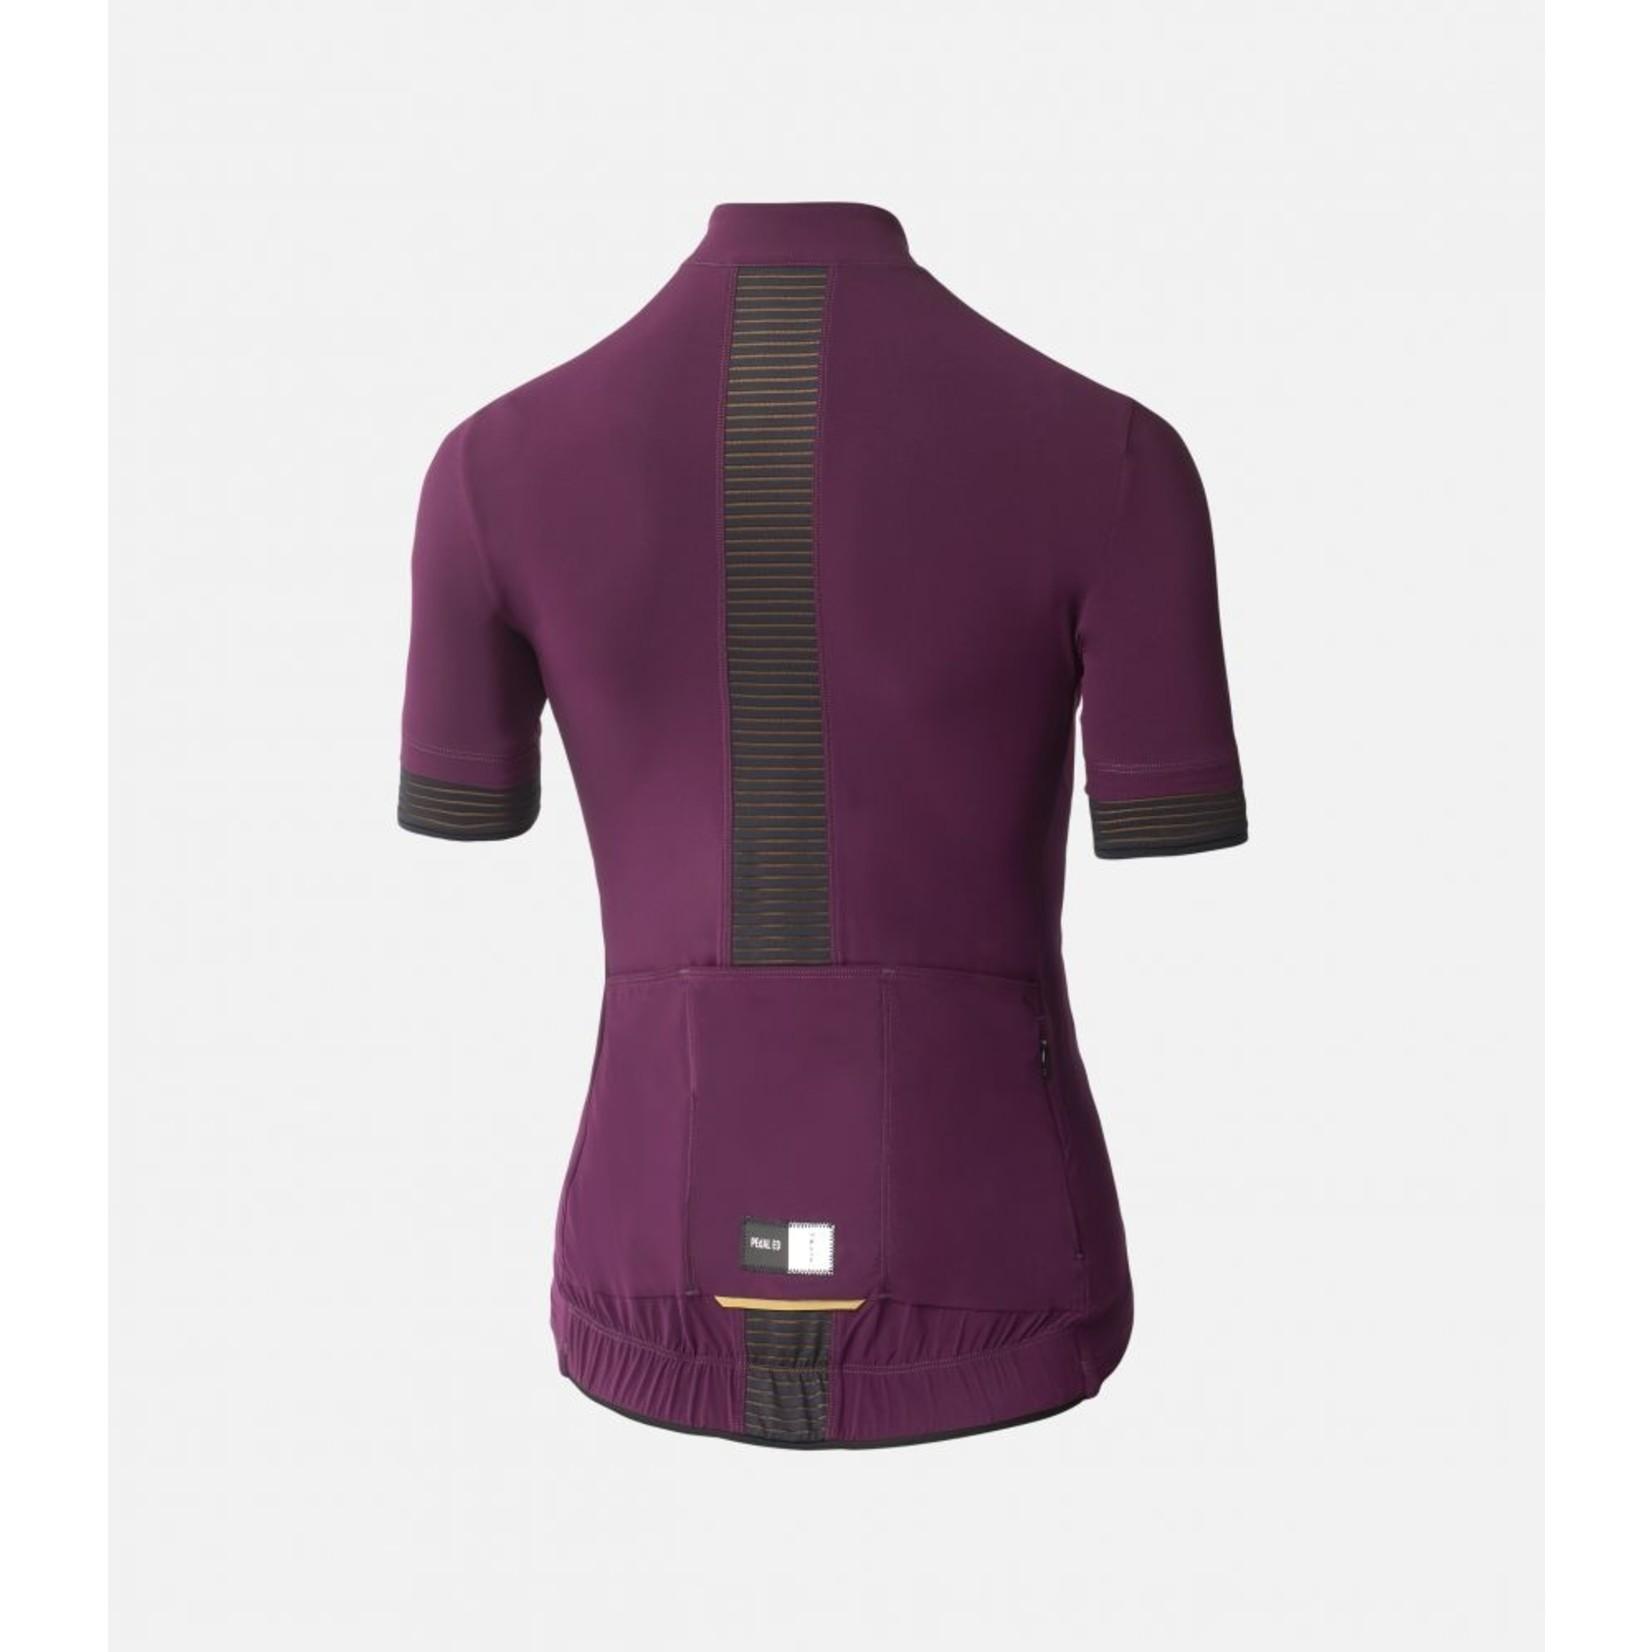 PEdALED PEdALED Women hane lightweight Jersey M Purple